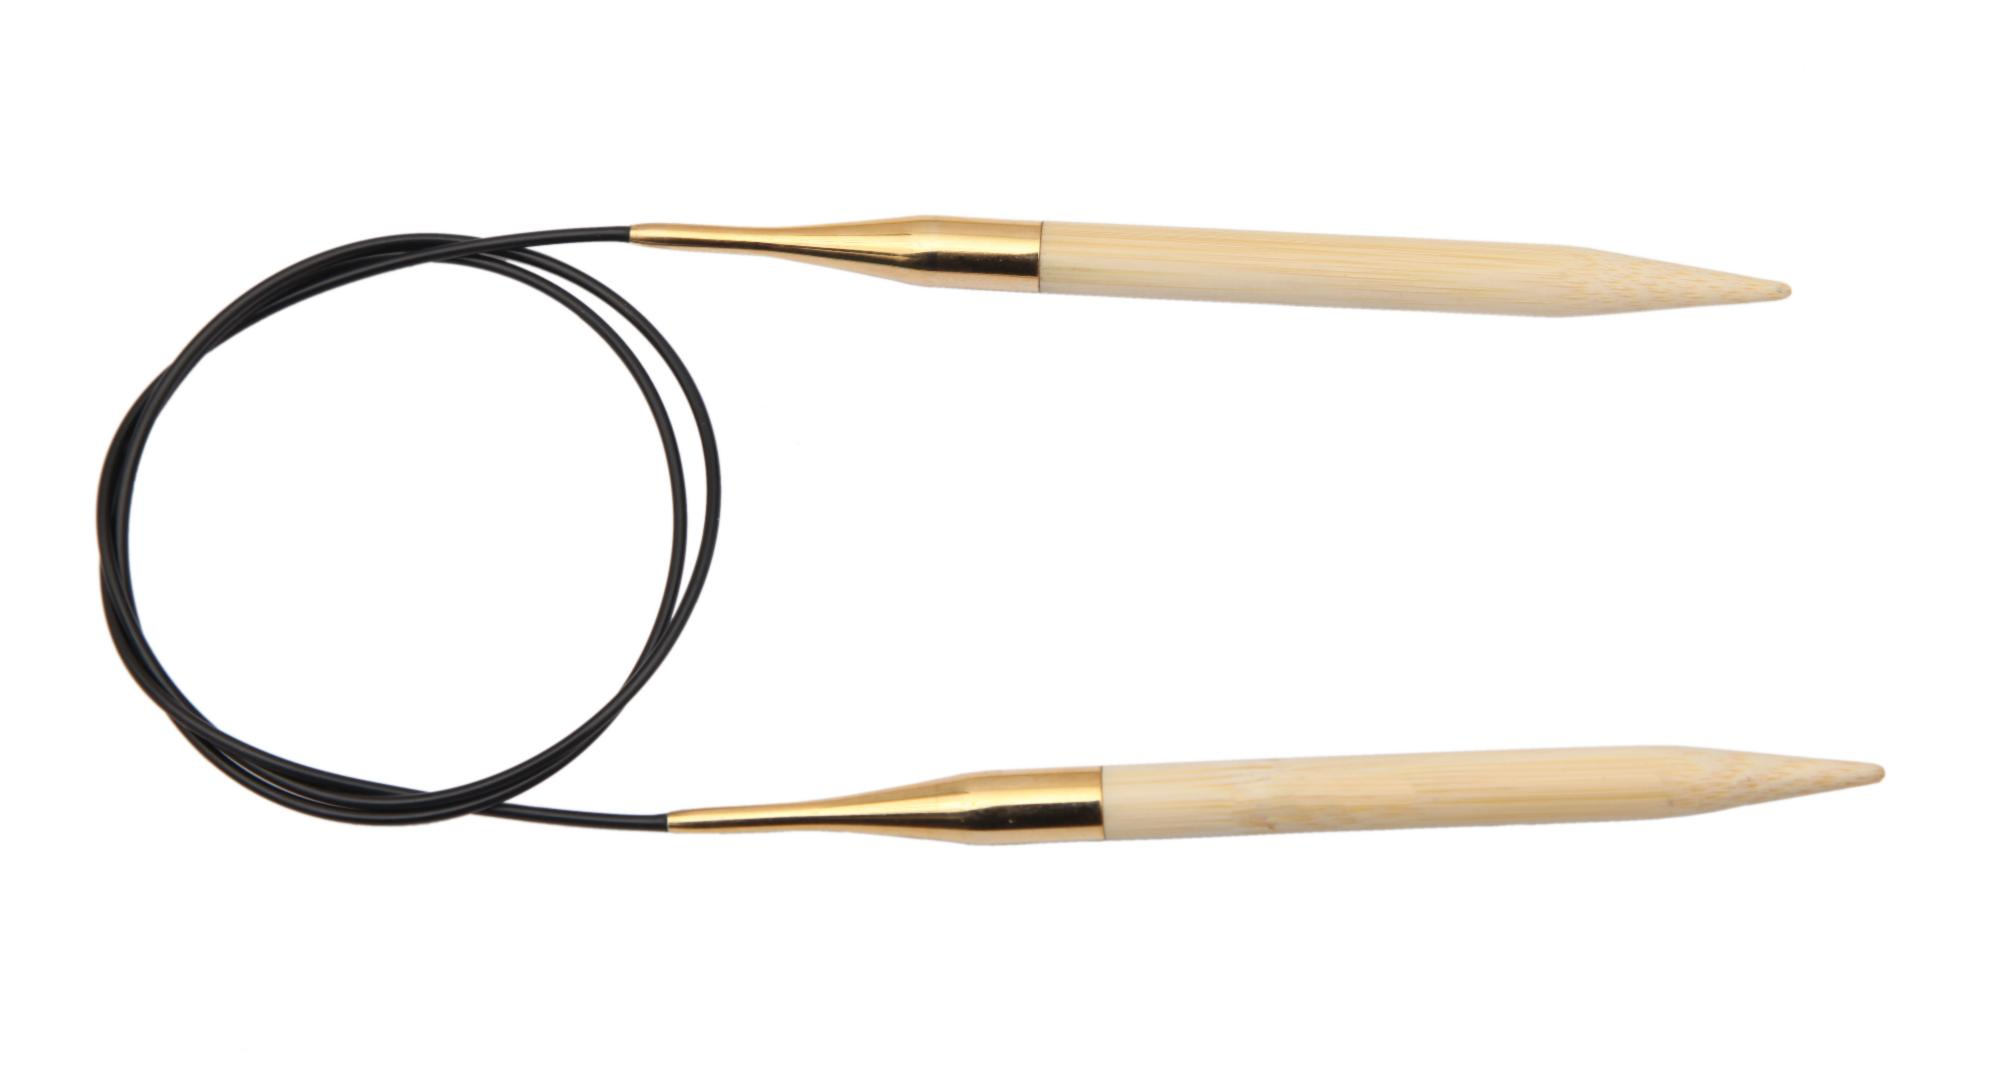 Спицы круговые 100 см Bamboo KnitPro, 22261, 2.00 мм